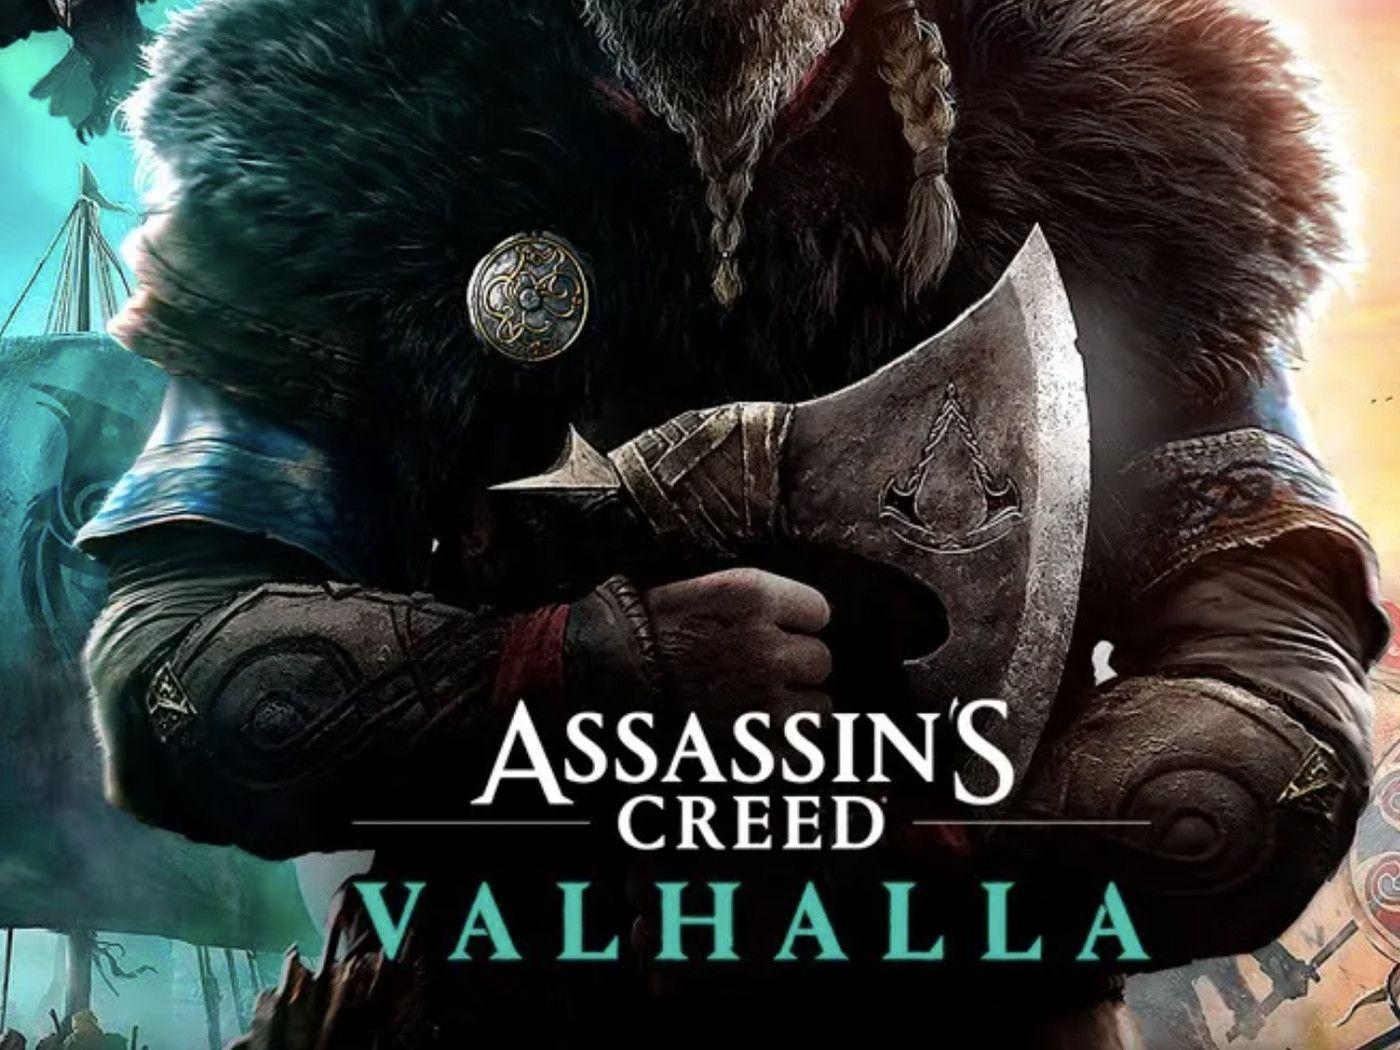 Assassins Creed Valhalla Wallpapers   Top Assassins Creed 1400x1050